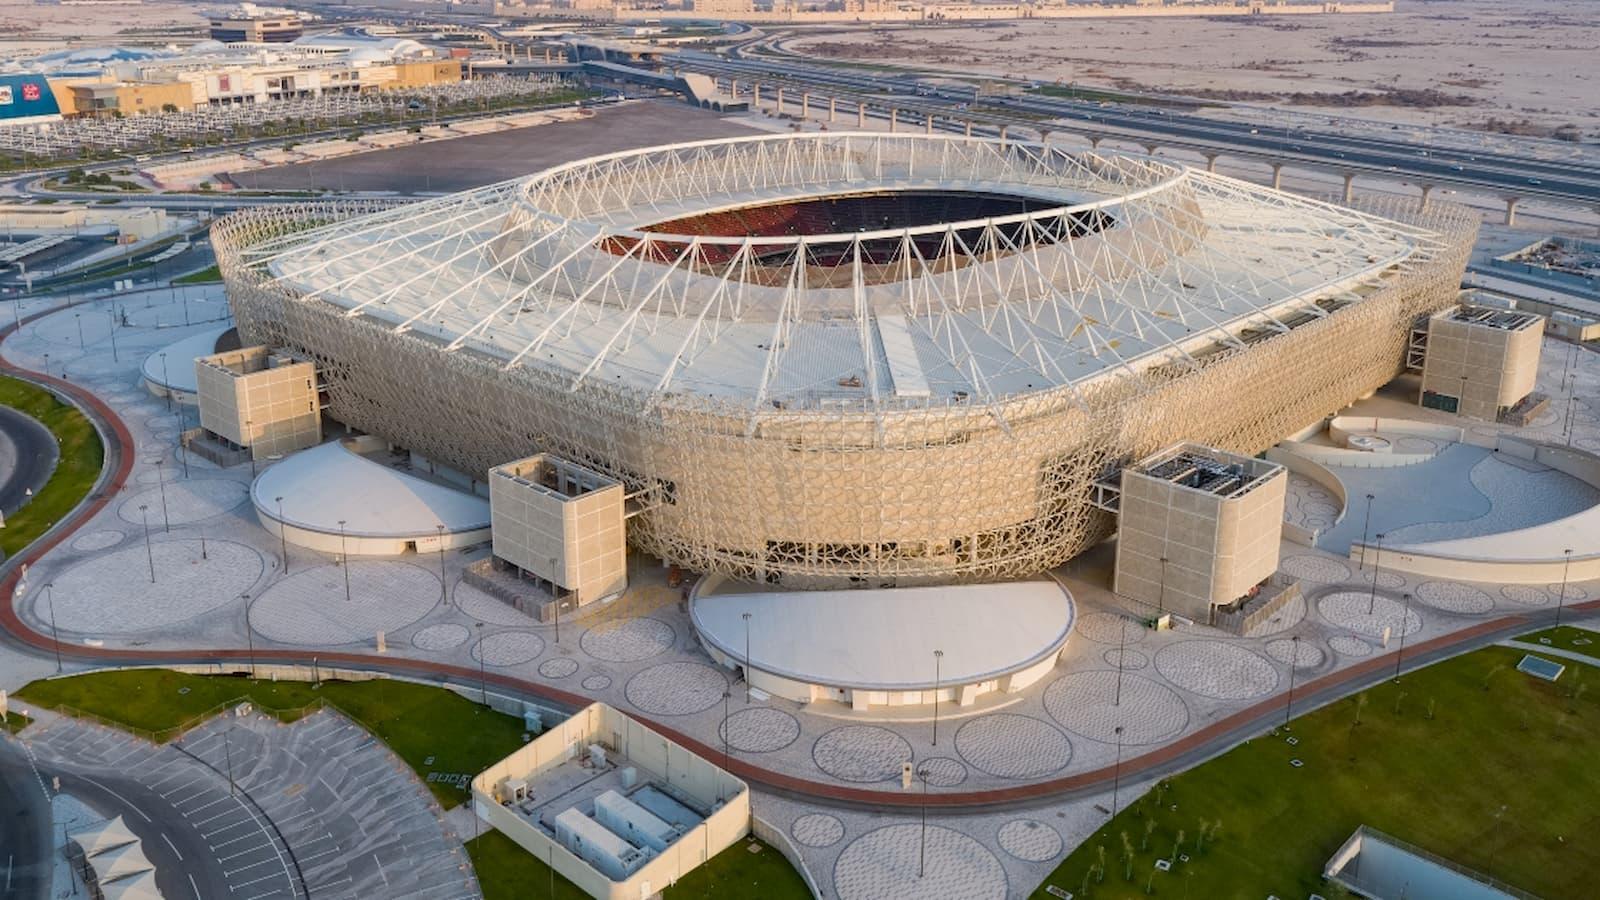 Al Rayyan Venue: A stadium that tells the story of Qatar